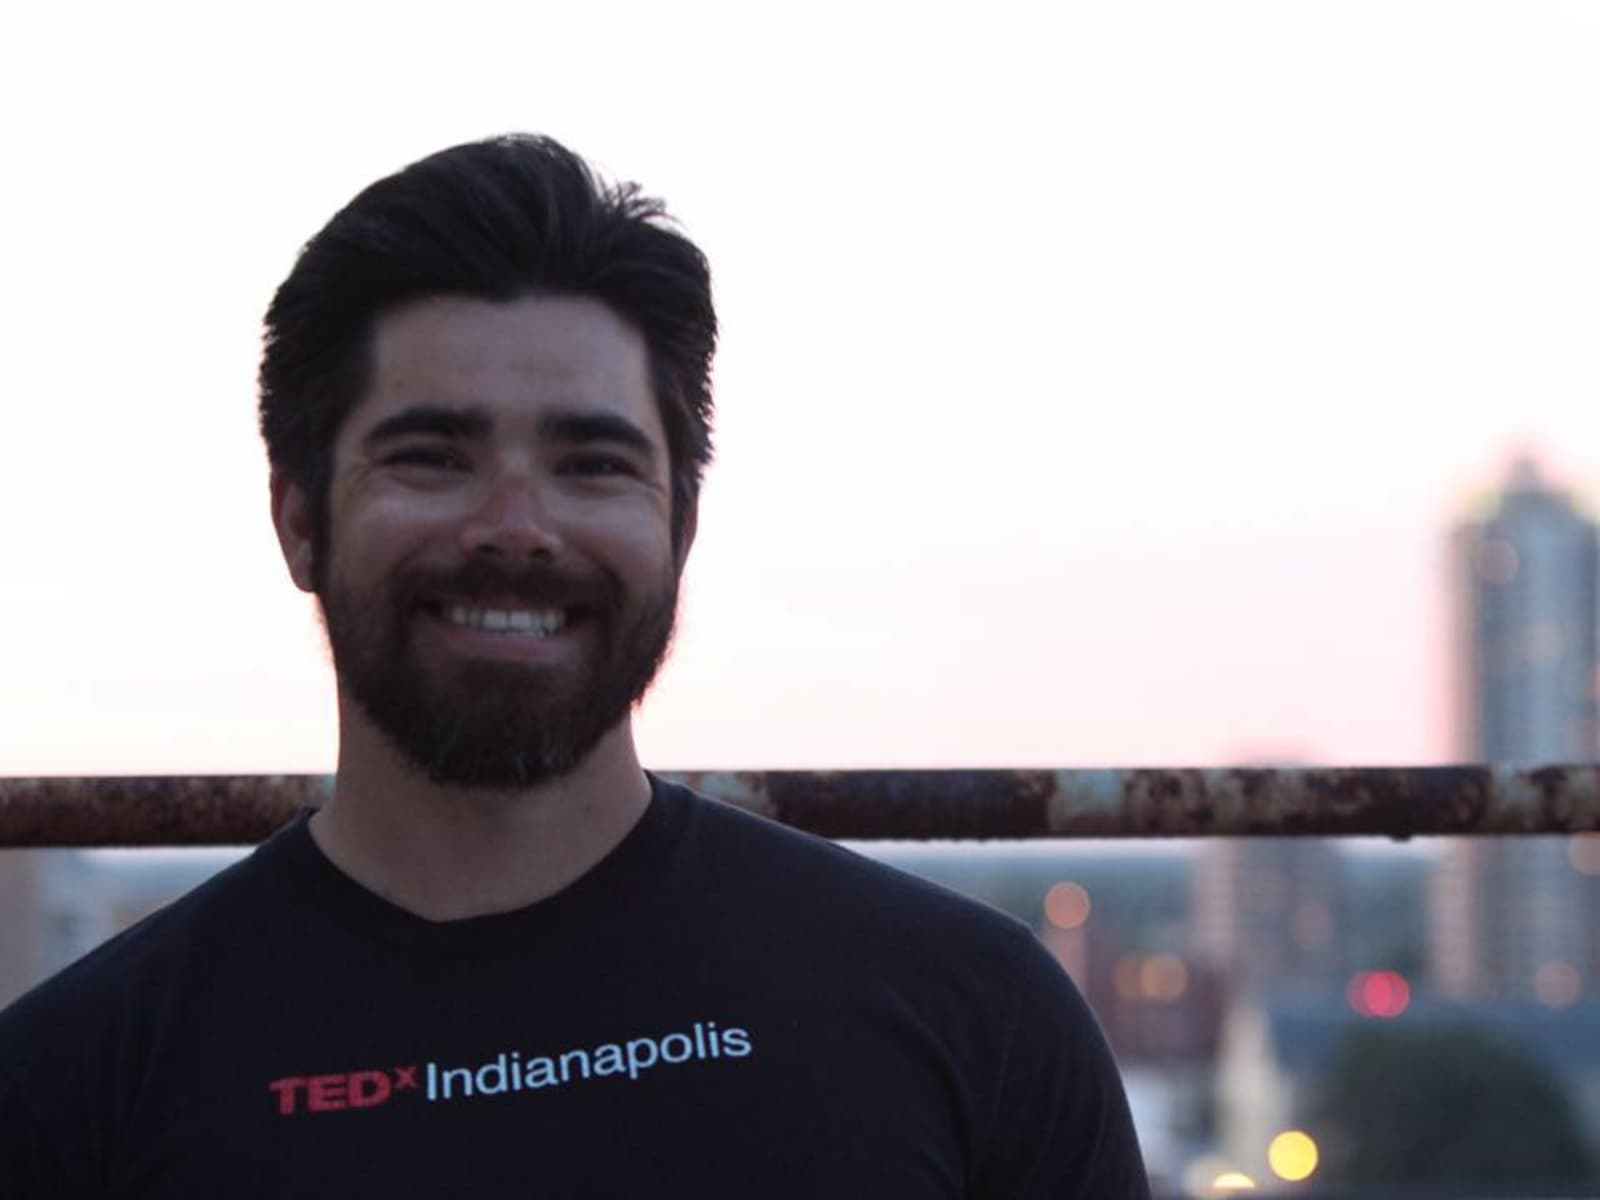 William from Indianapolis, Indiana, United States